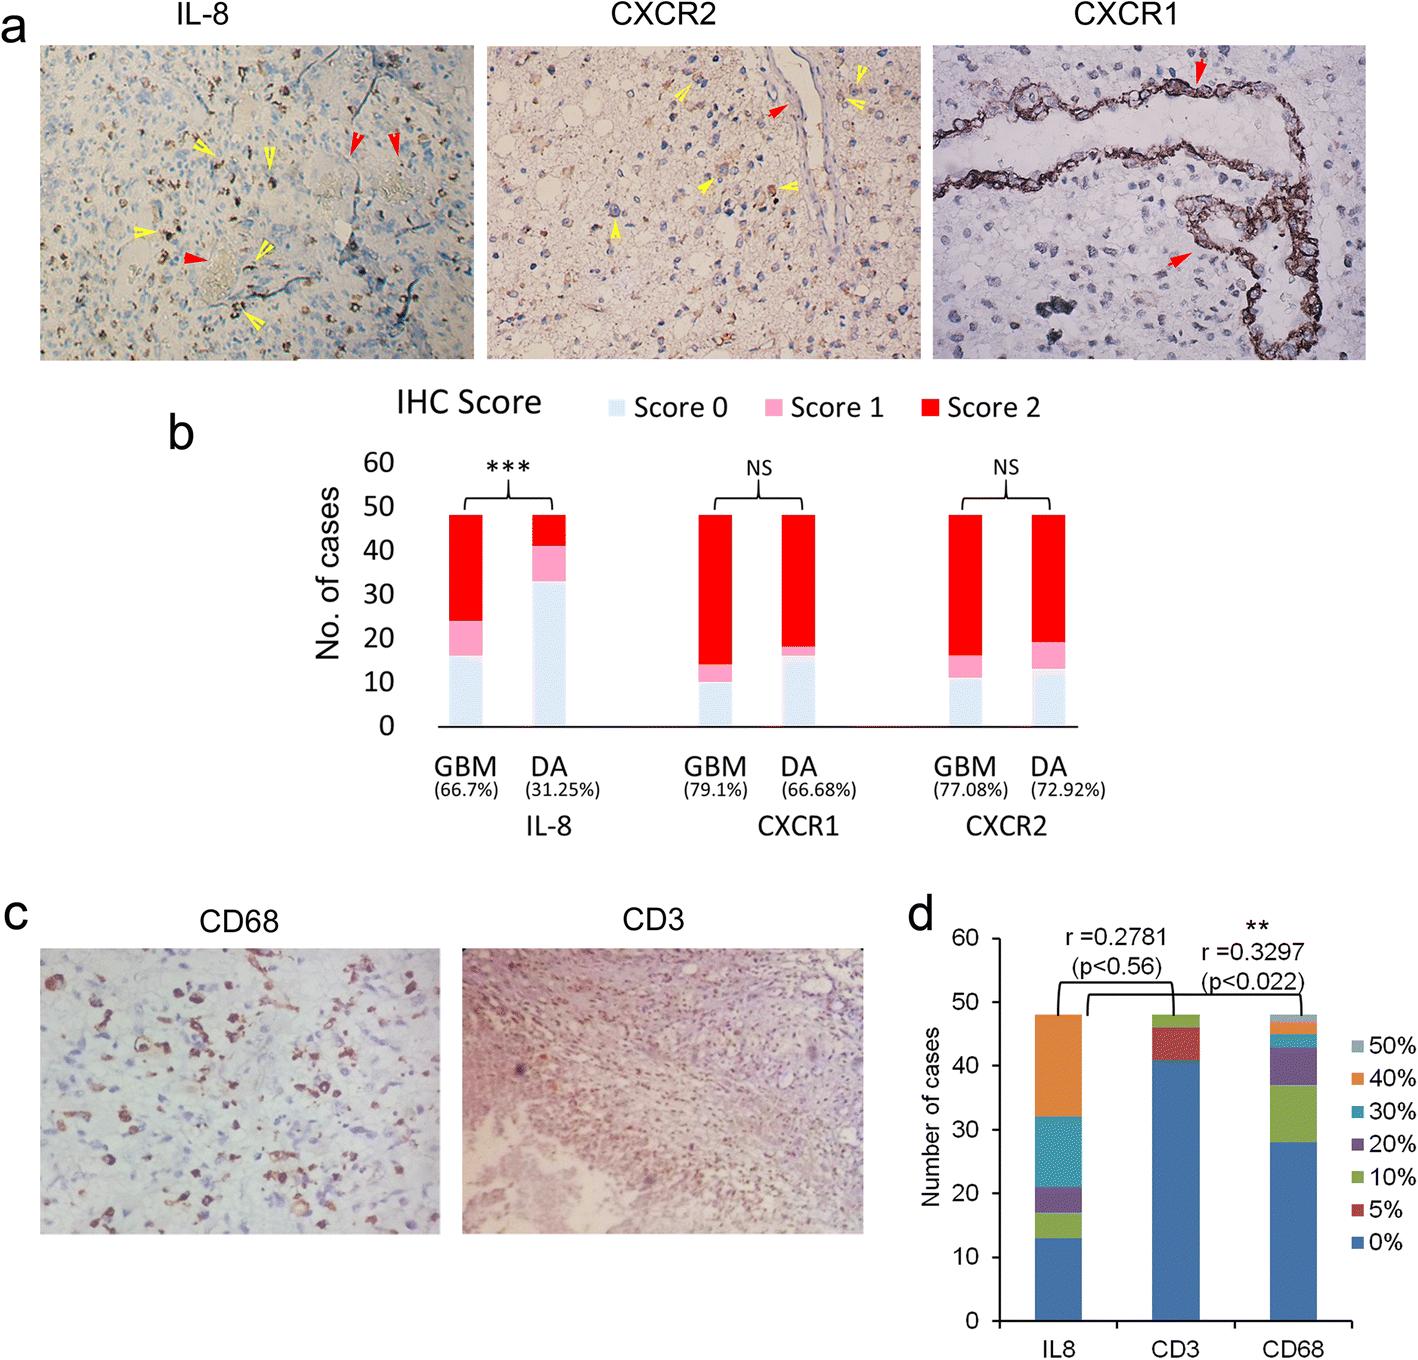 Il 8 Cxcr1 2 Signalling Promotes Tumor Cell Proliferation Invasion Http Wwwelectronicsprojectdesigncom Bargraphledhtml Open Image In New Window